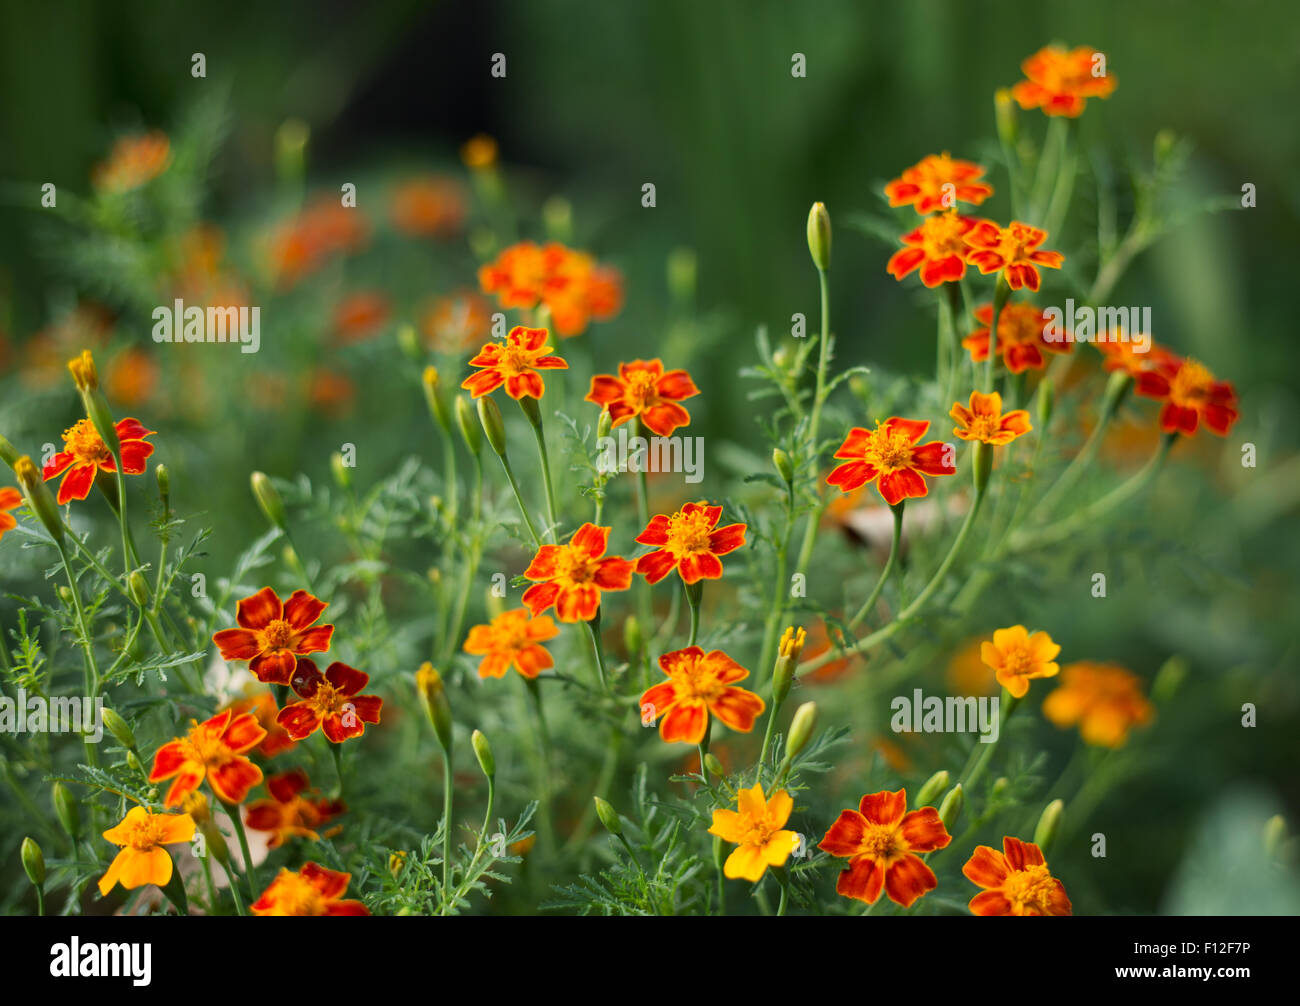 - Flores de caléndula Tagetes - Flores de Naranja sobre el pasto verde de fondo - profundidad de enfoque superficial Foto de stock